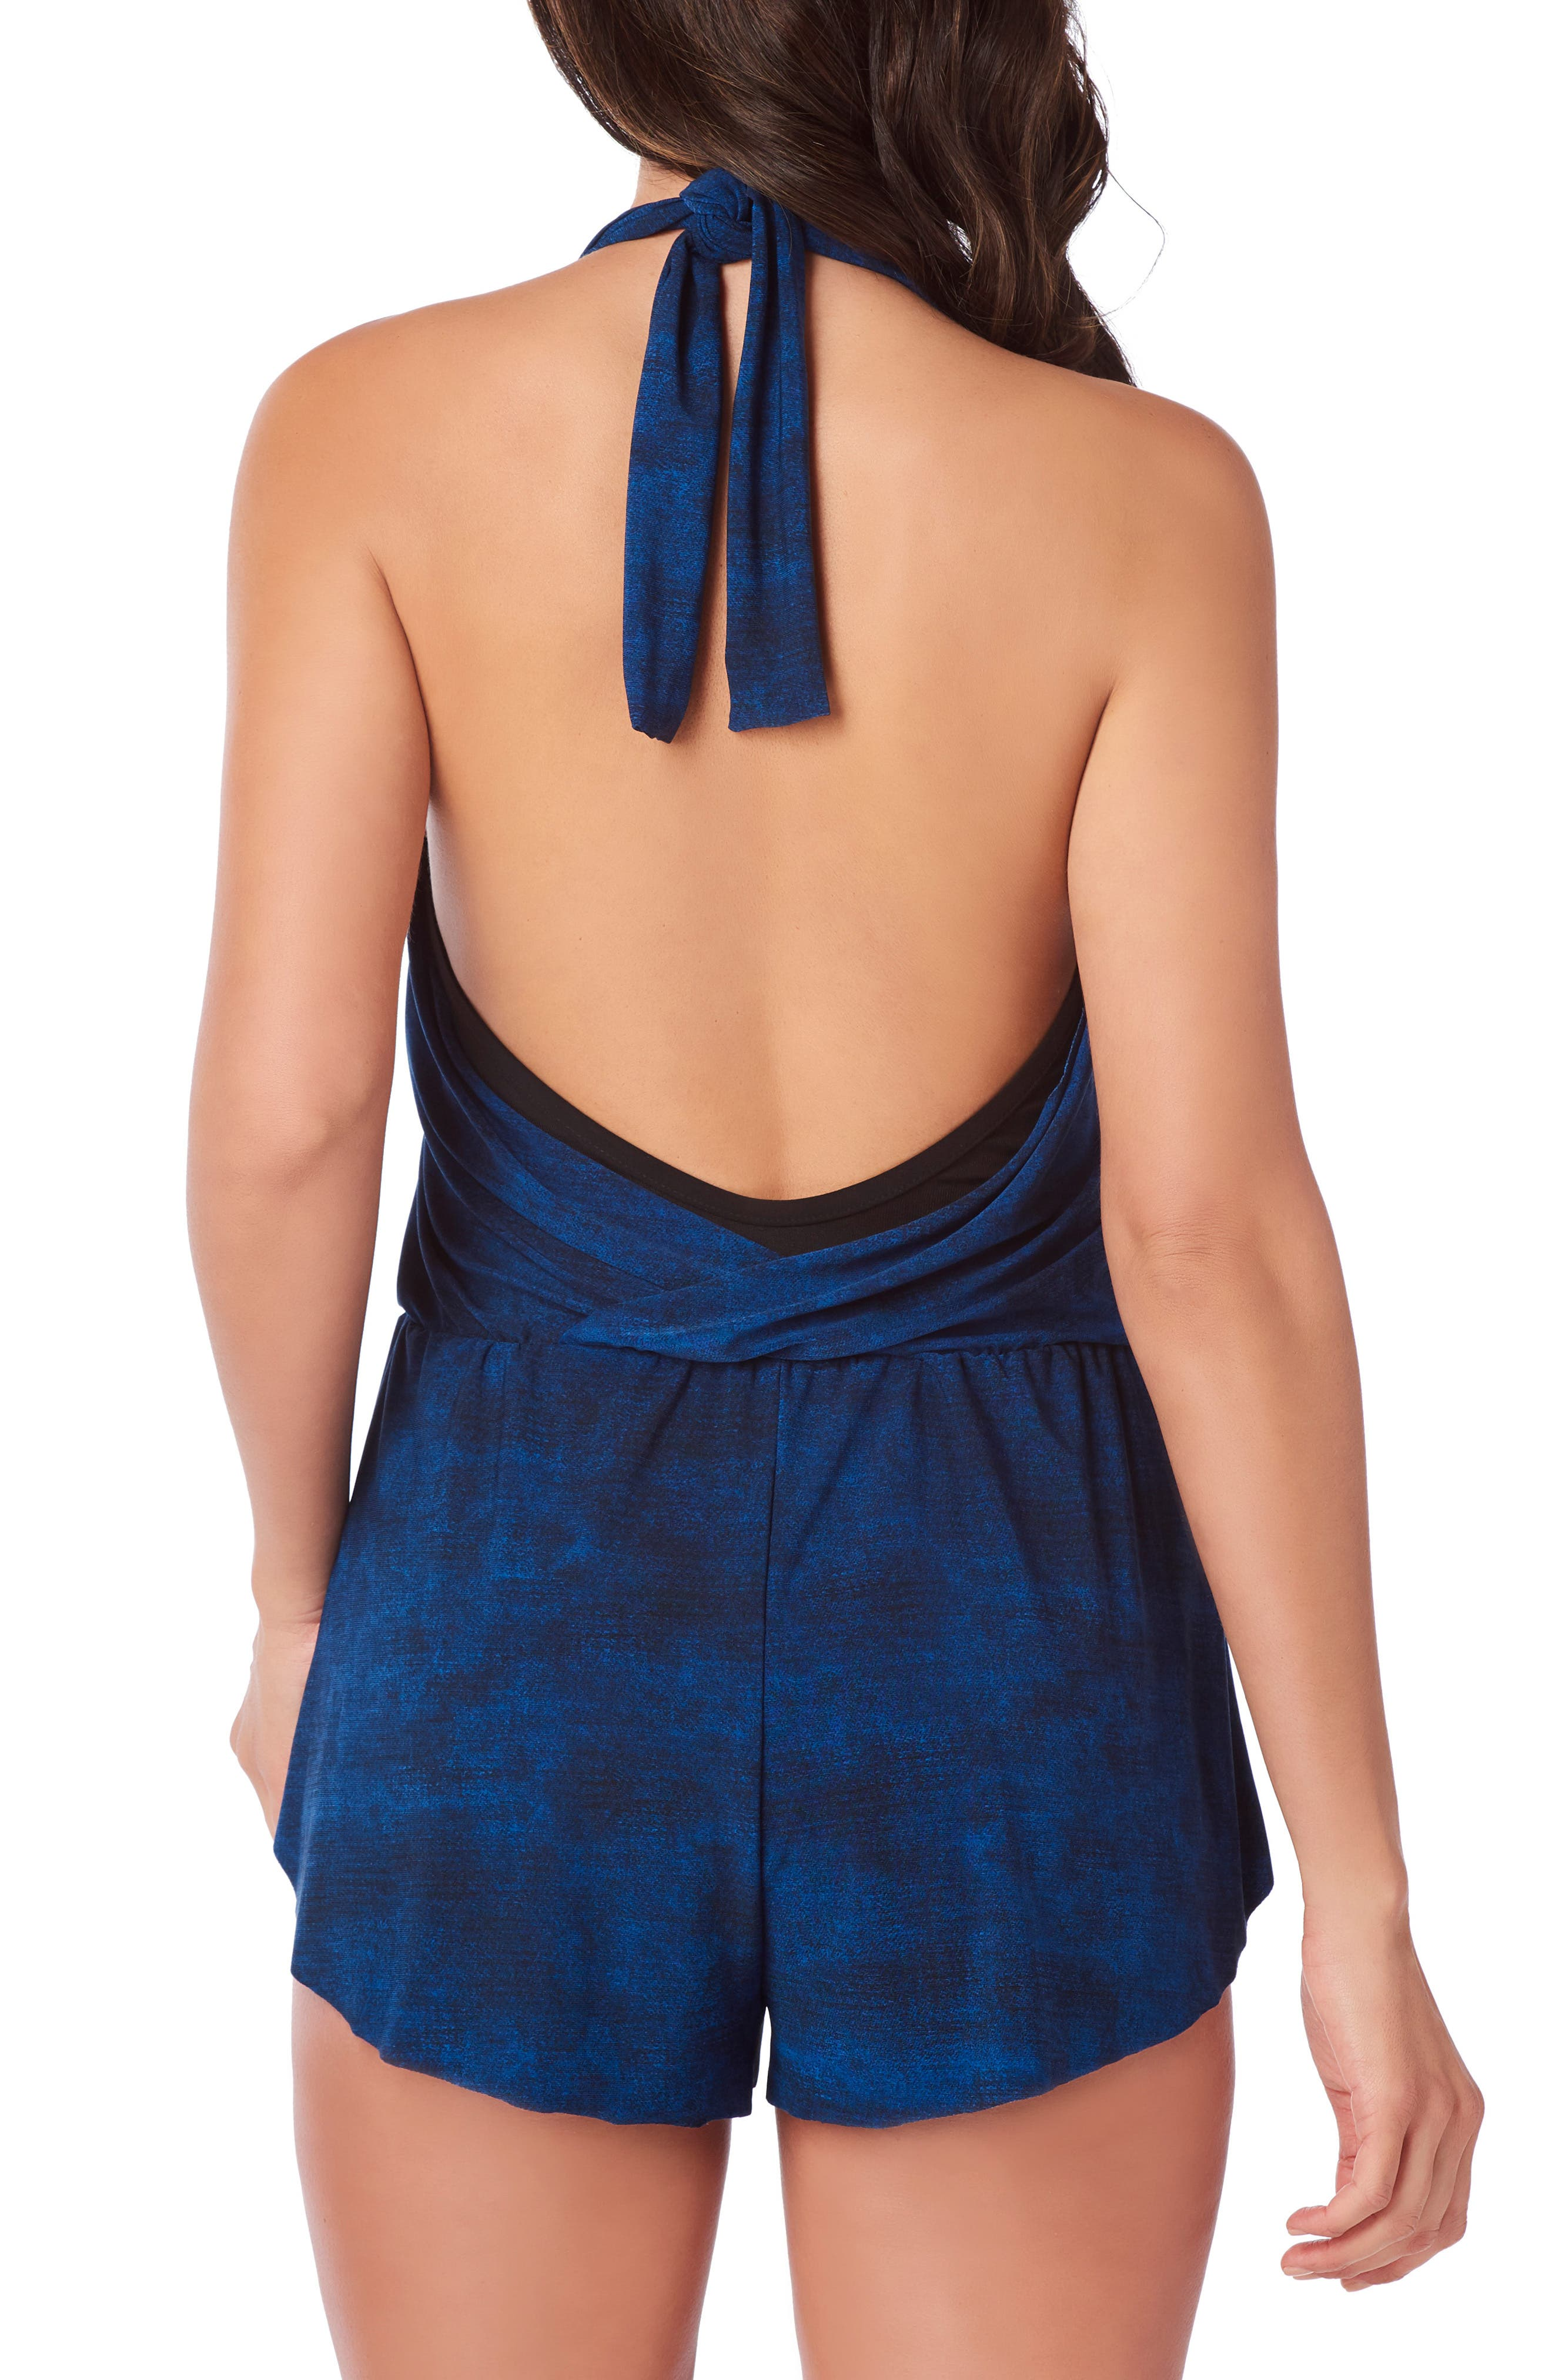 Skinny Jeans Bianca One-Piece Romper Swimsuit,                             Alternate thumbnail 2, color,                             DENIM